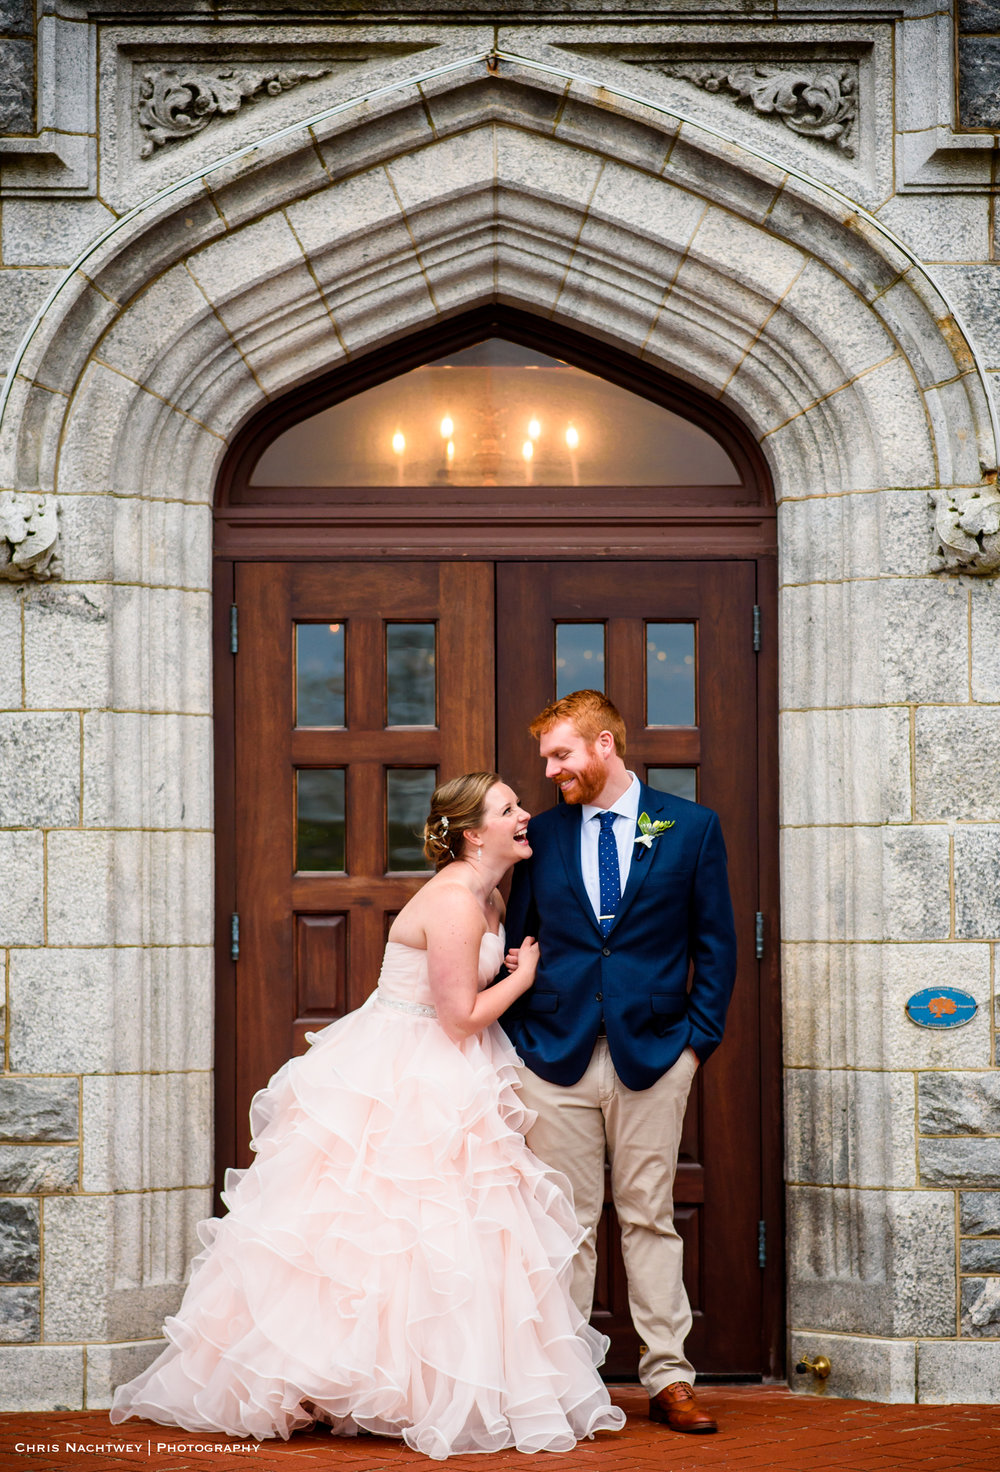 ct-wedding-photos-branford-house-groton-ct-chris-nachtwey-photography-2018-b-a-25.jpg